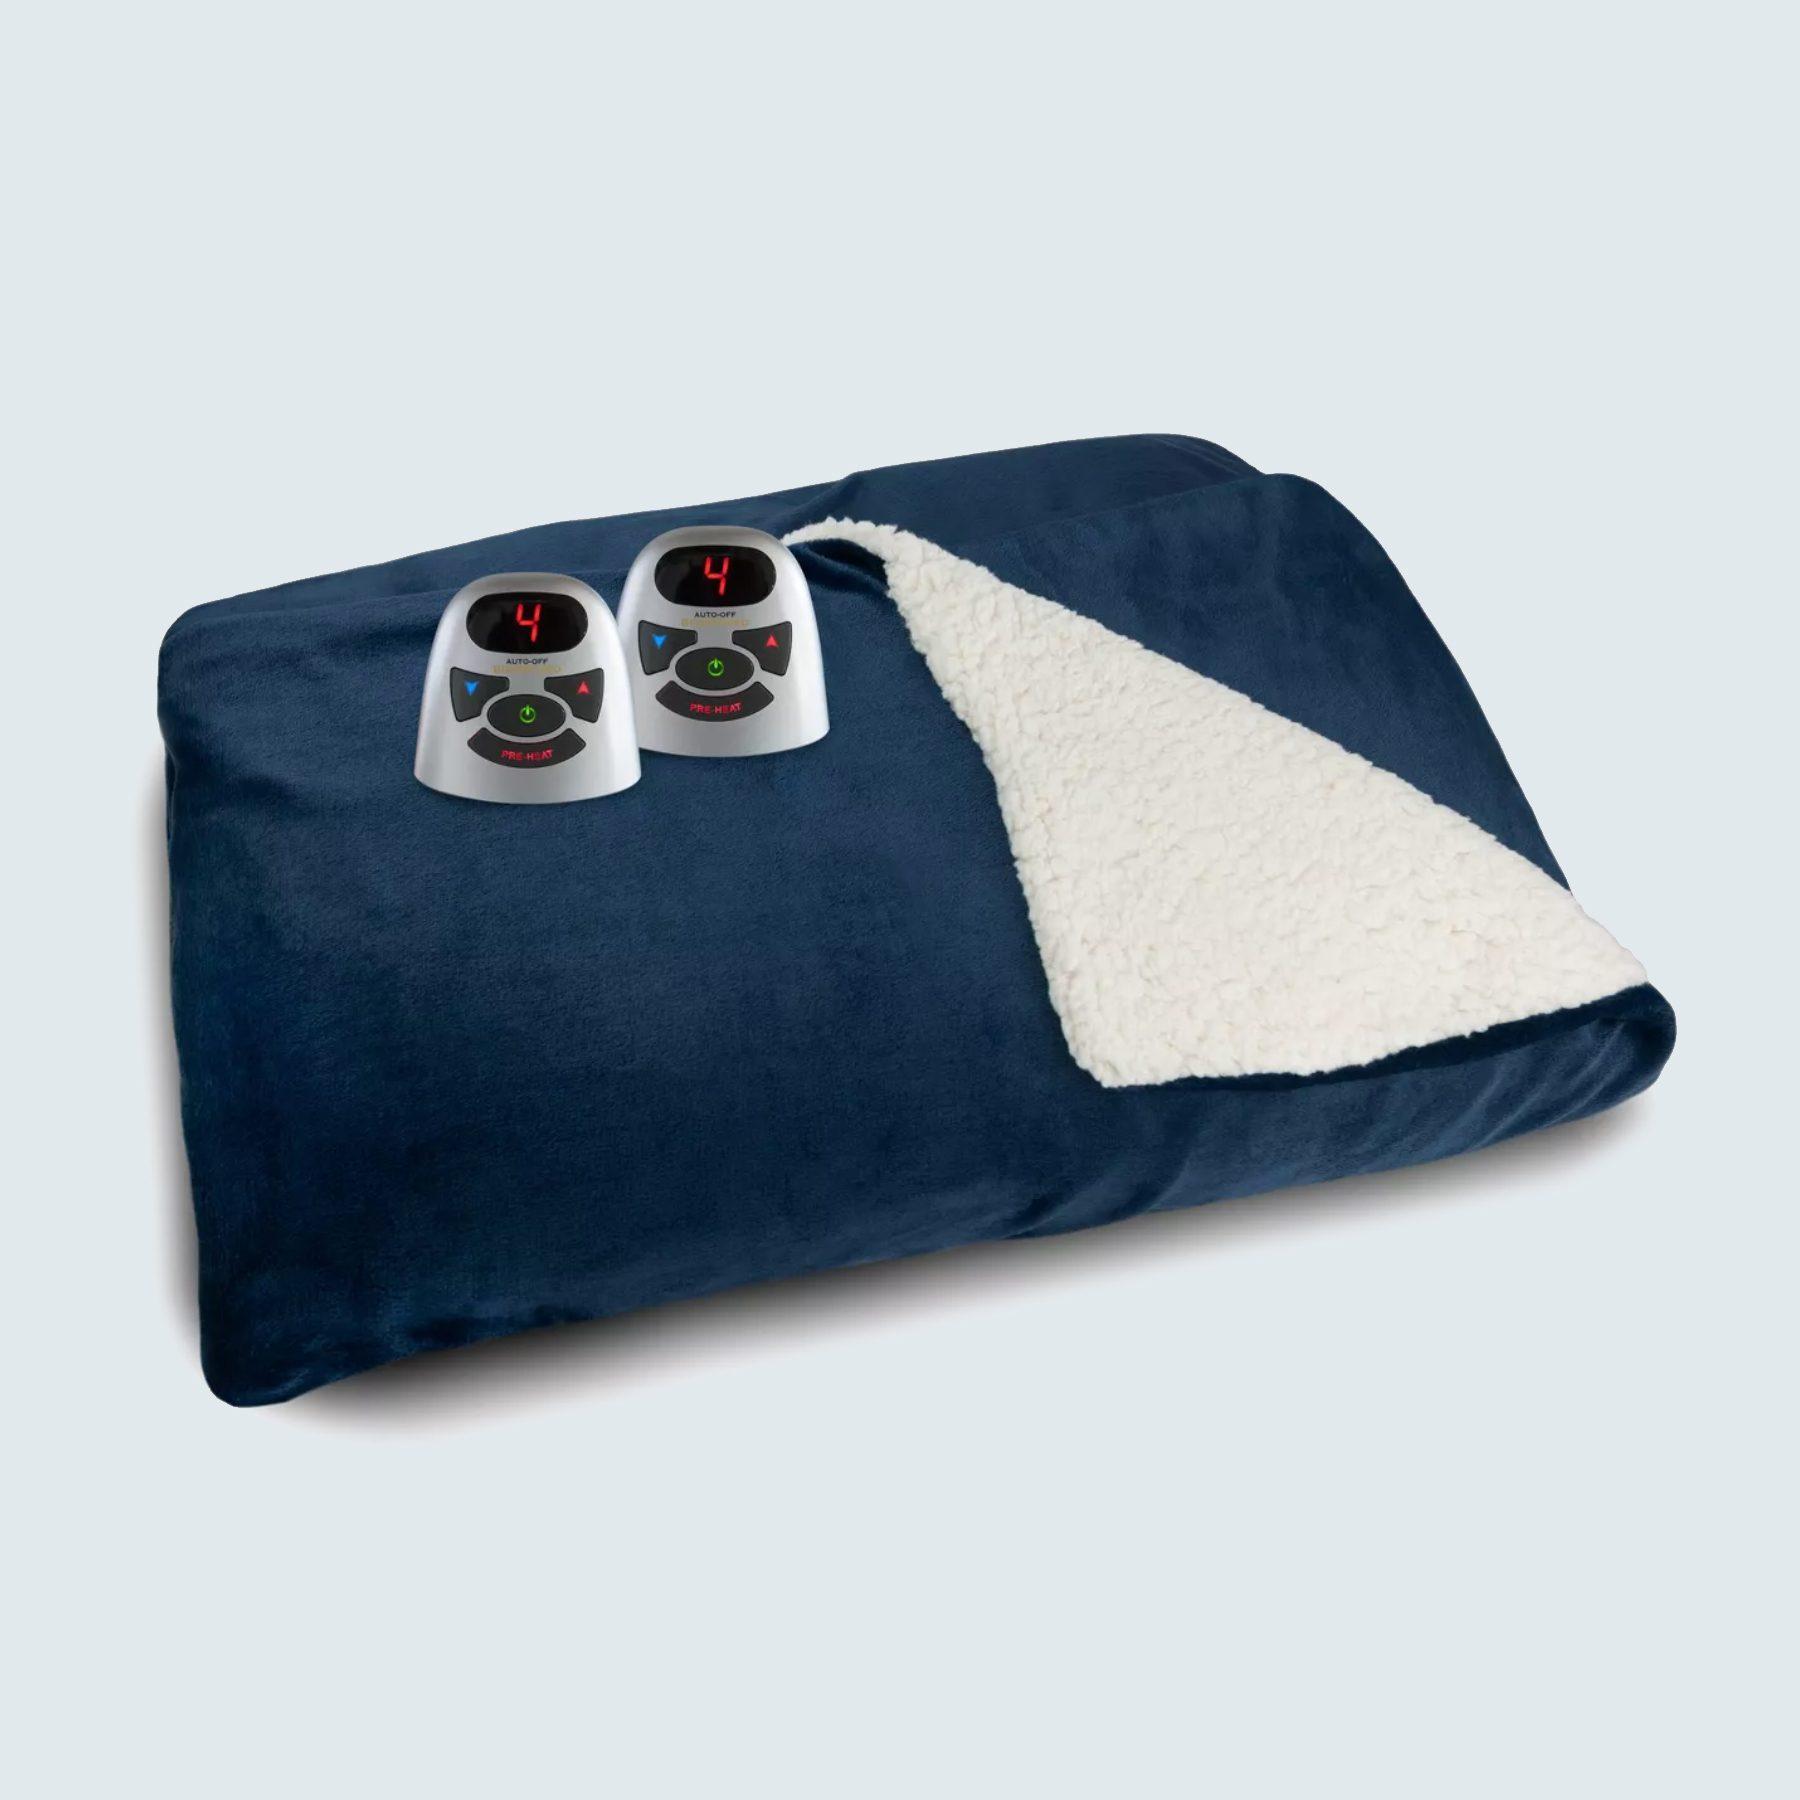 Biddeford Velour and Sherpa Electric Blanket